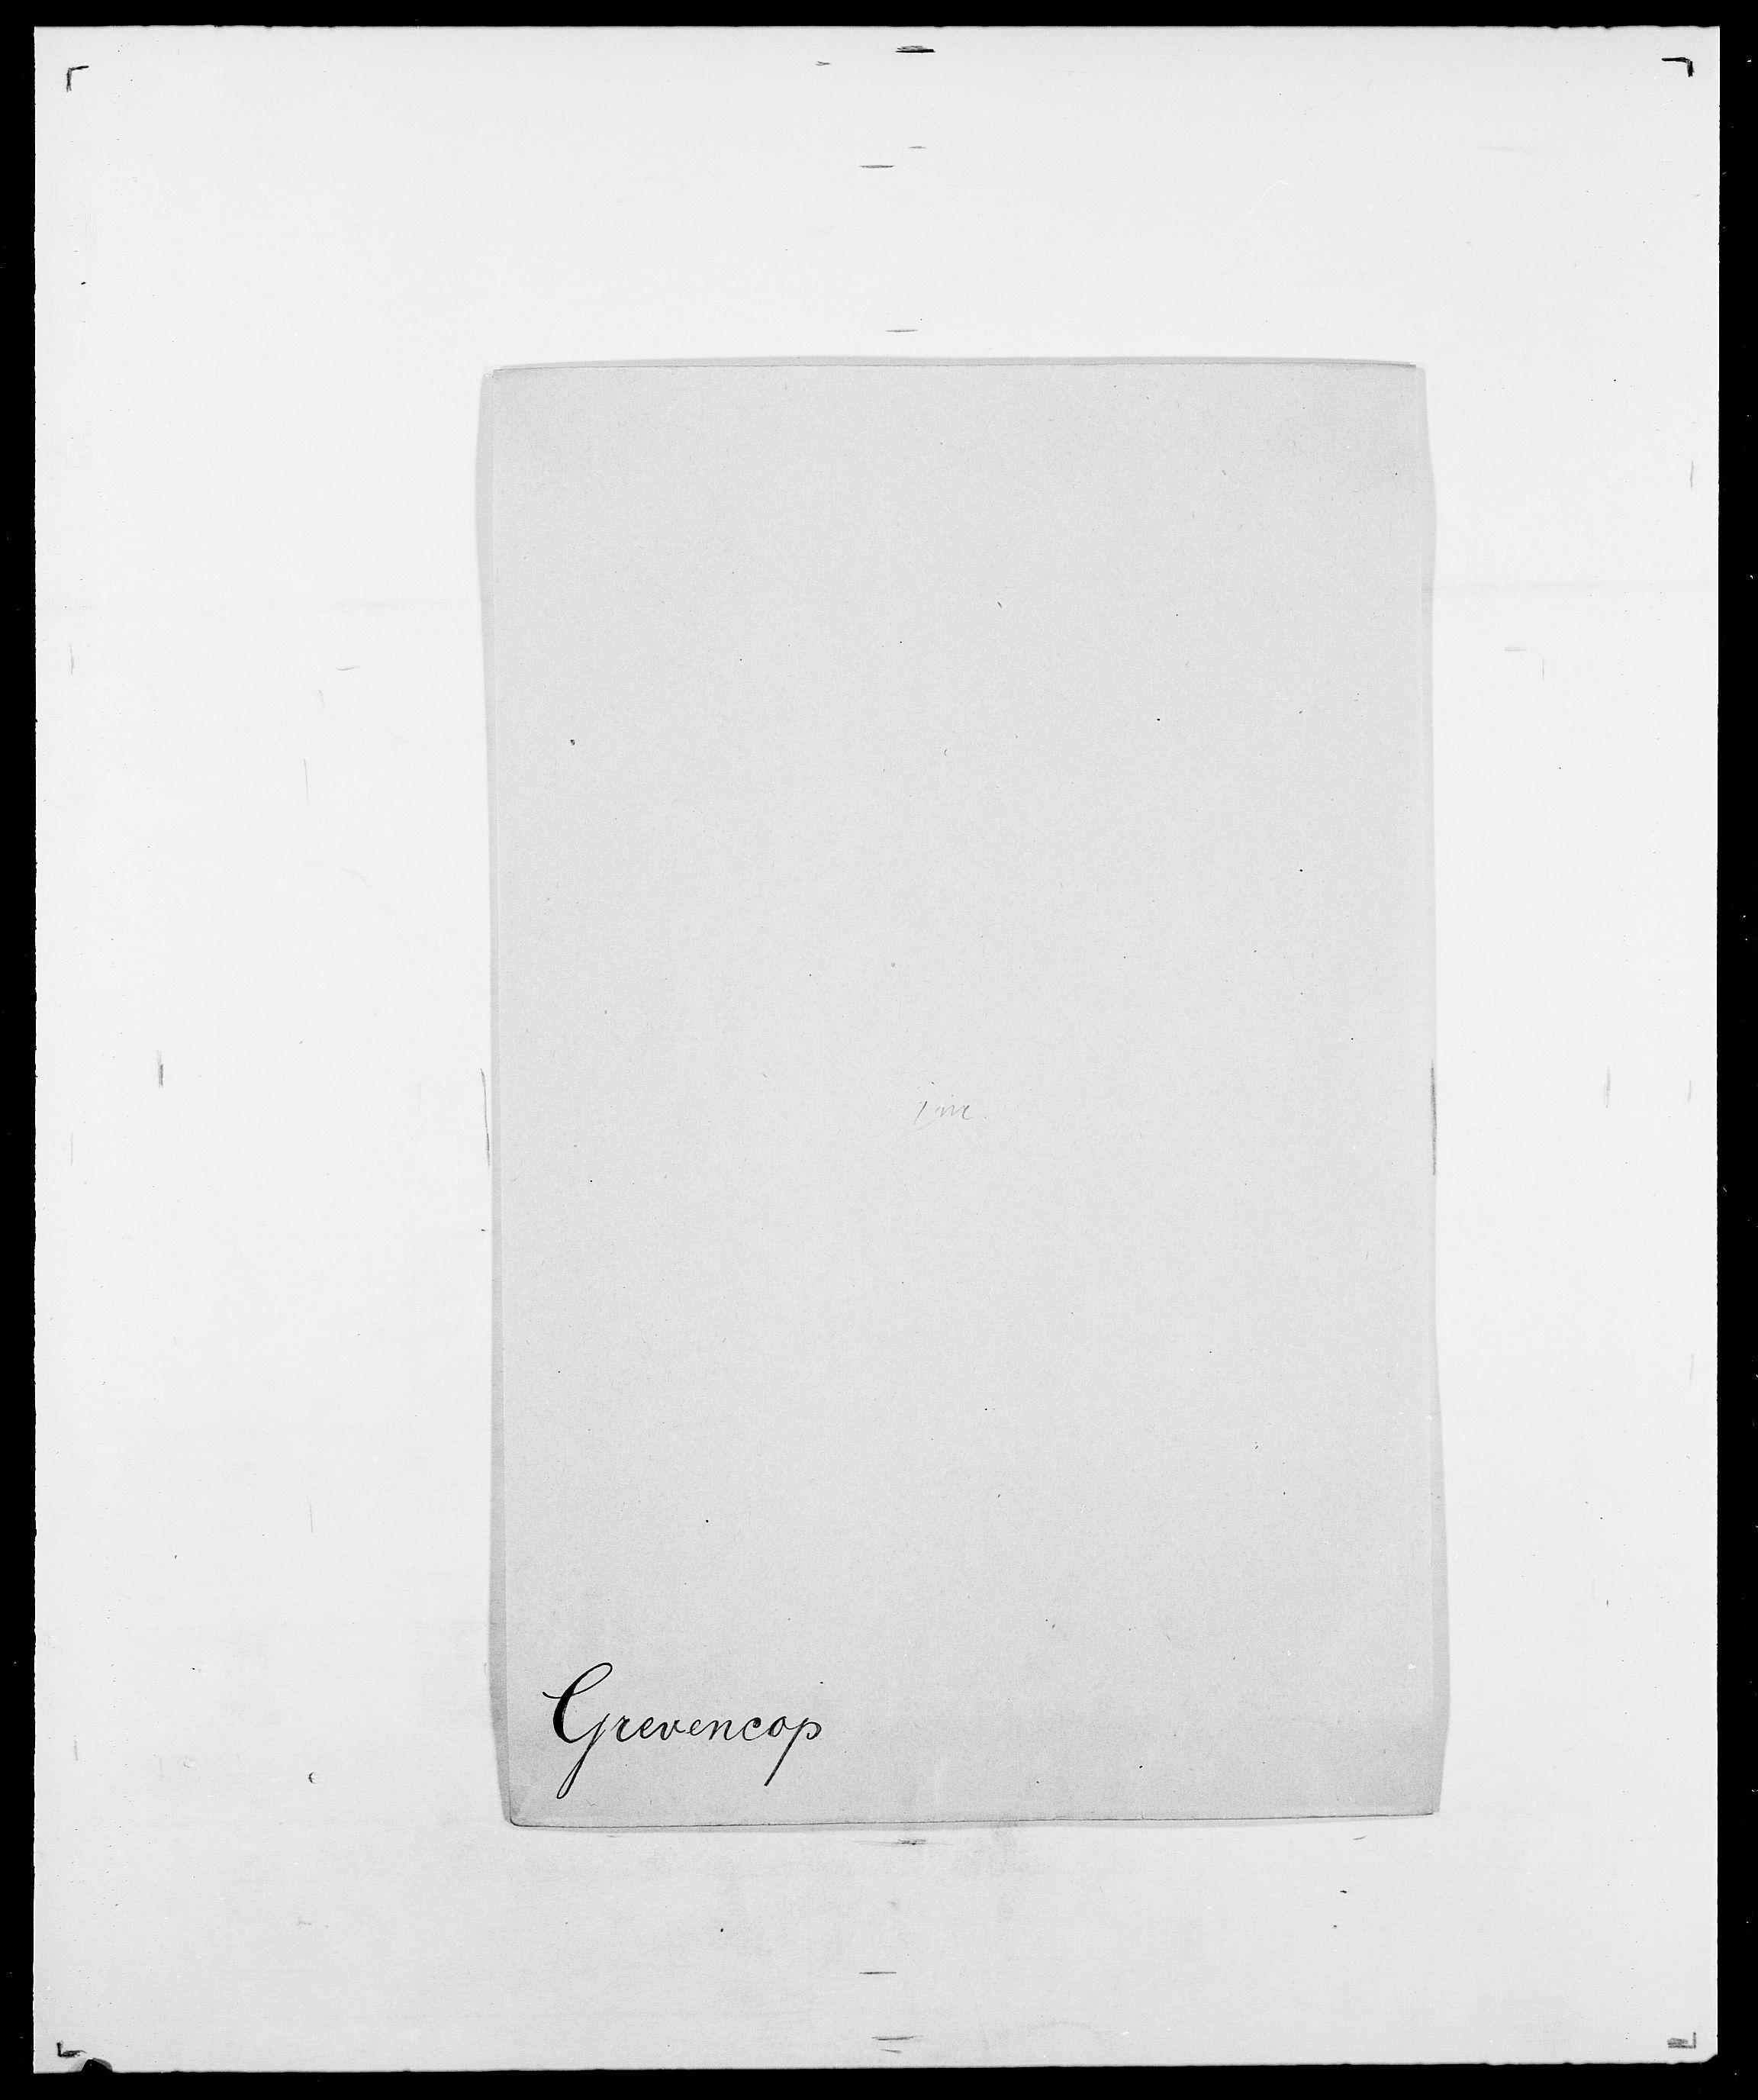 SAO, Delgobe, Charles Antoine - samling, D/Da/L0014: Giebdhausen - Grip, s. 635